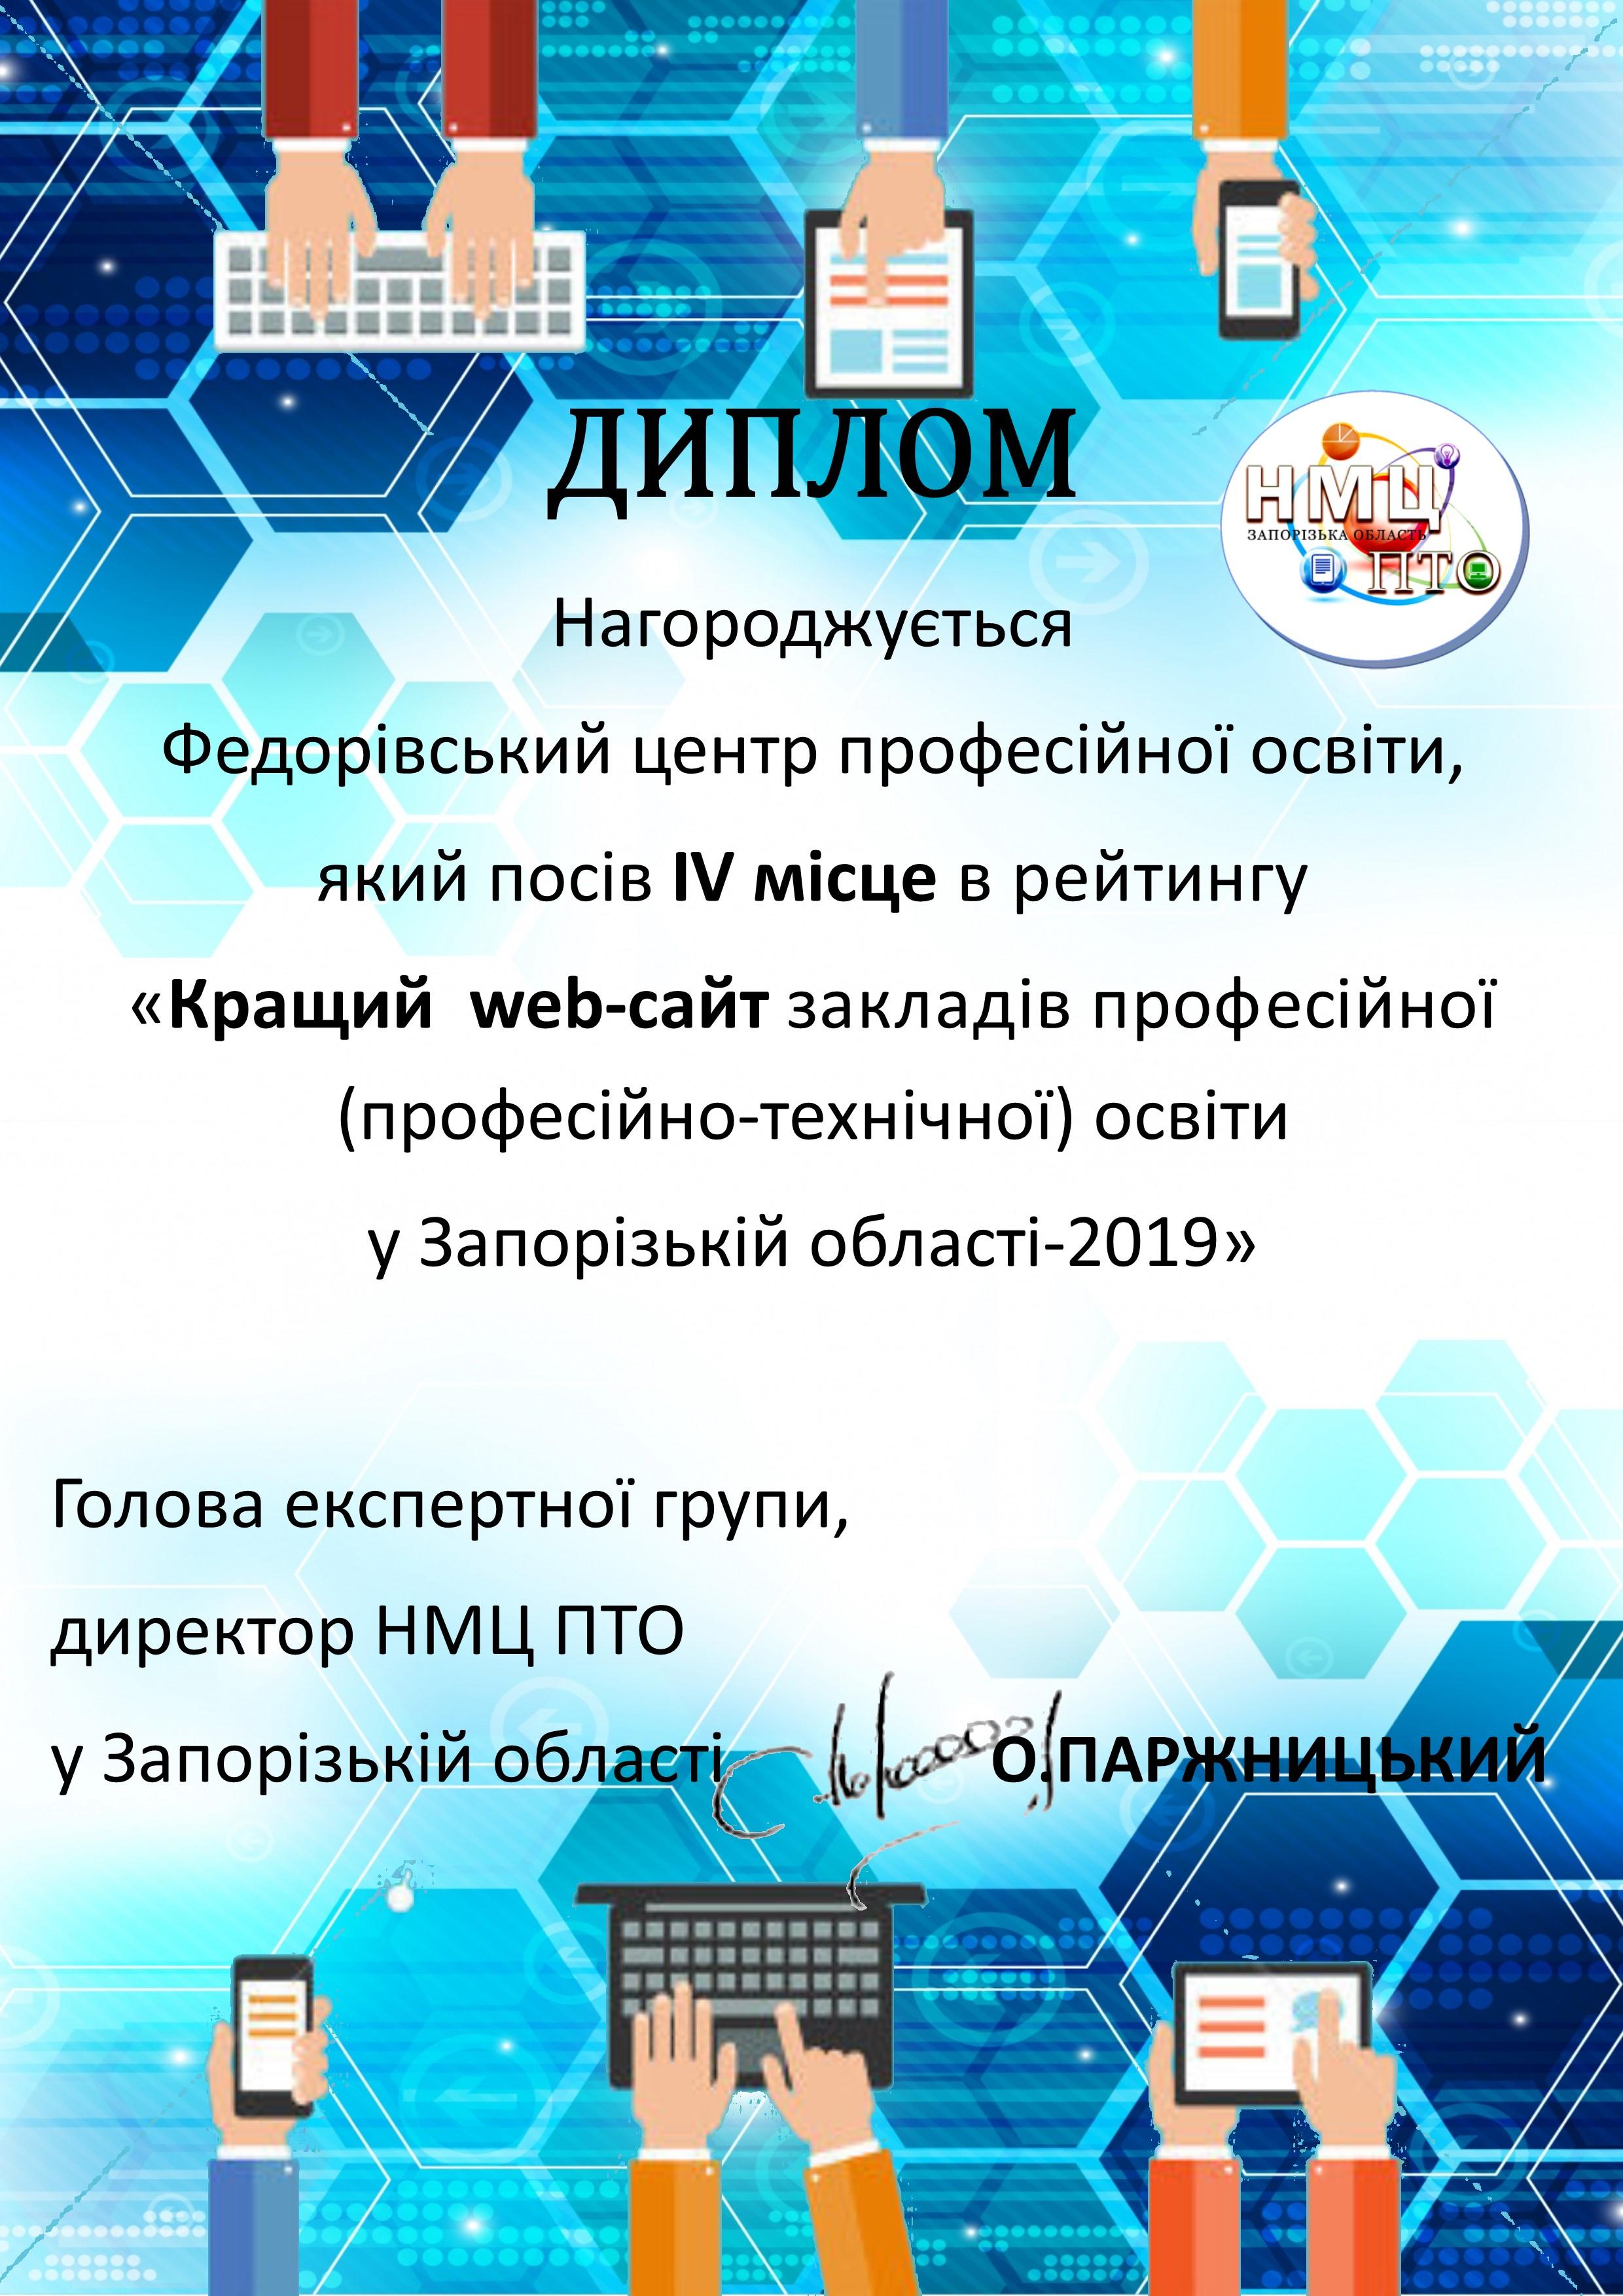 диплом ЧЦПТО